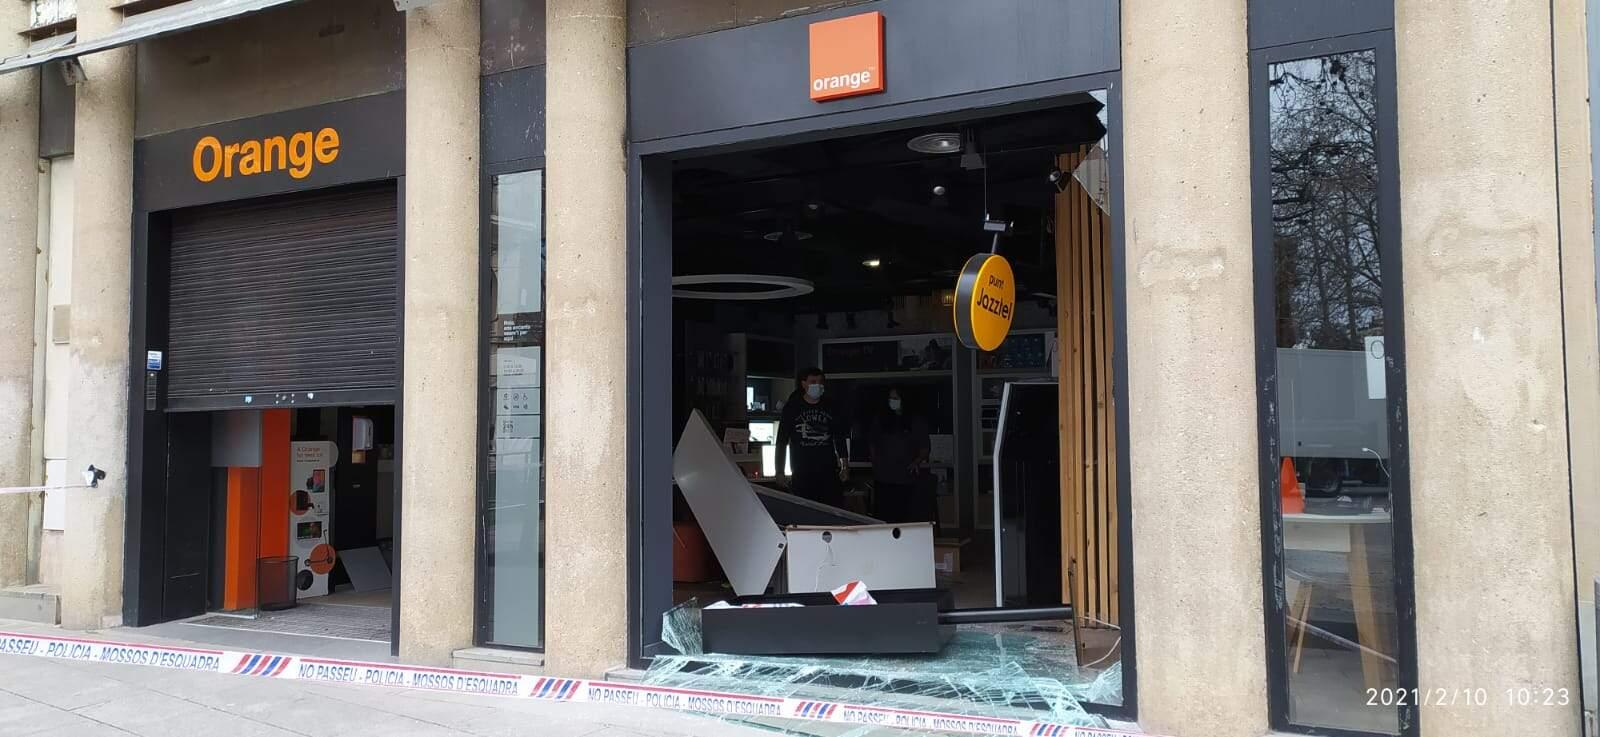 La botiga Orange de la plaça Vella ha estat víctima d'un robatori